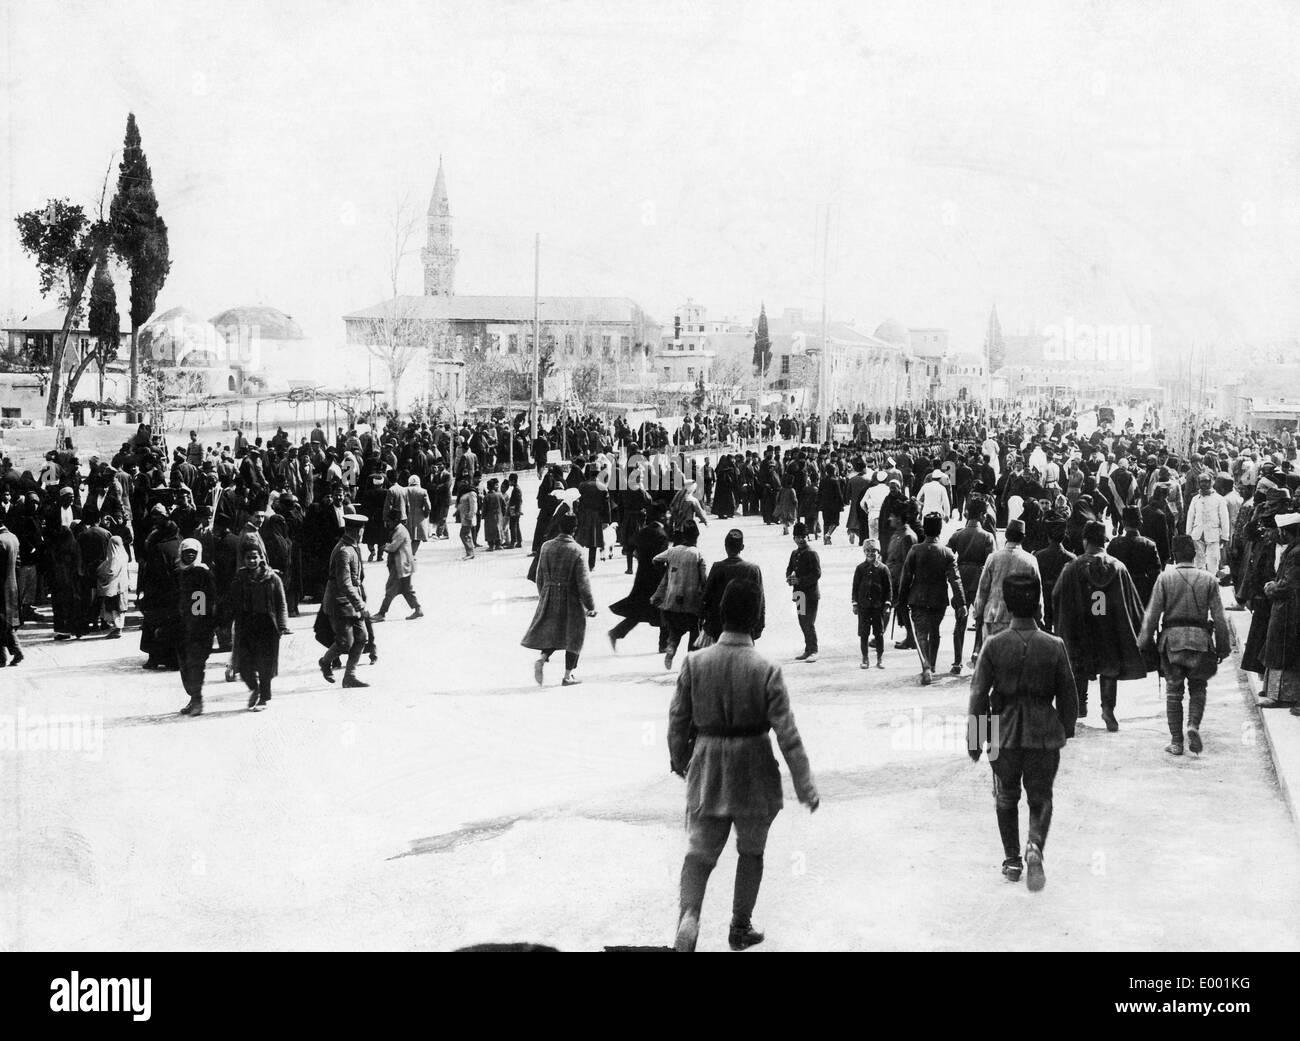 Turkish troops in Damaskus in World War I, 1917 - Stock Image